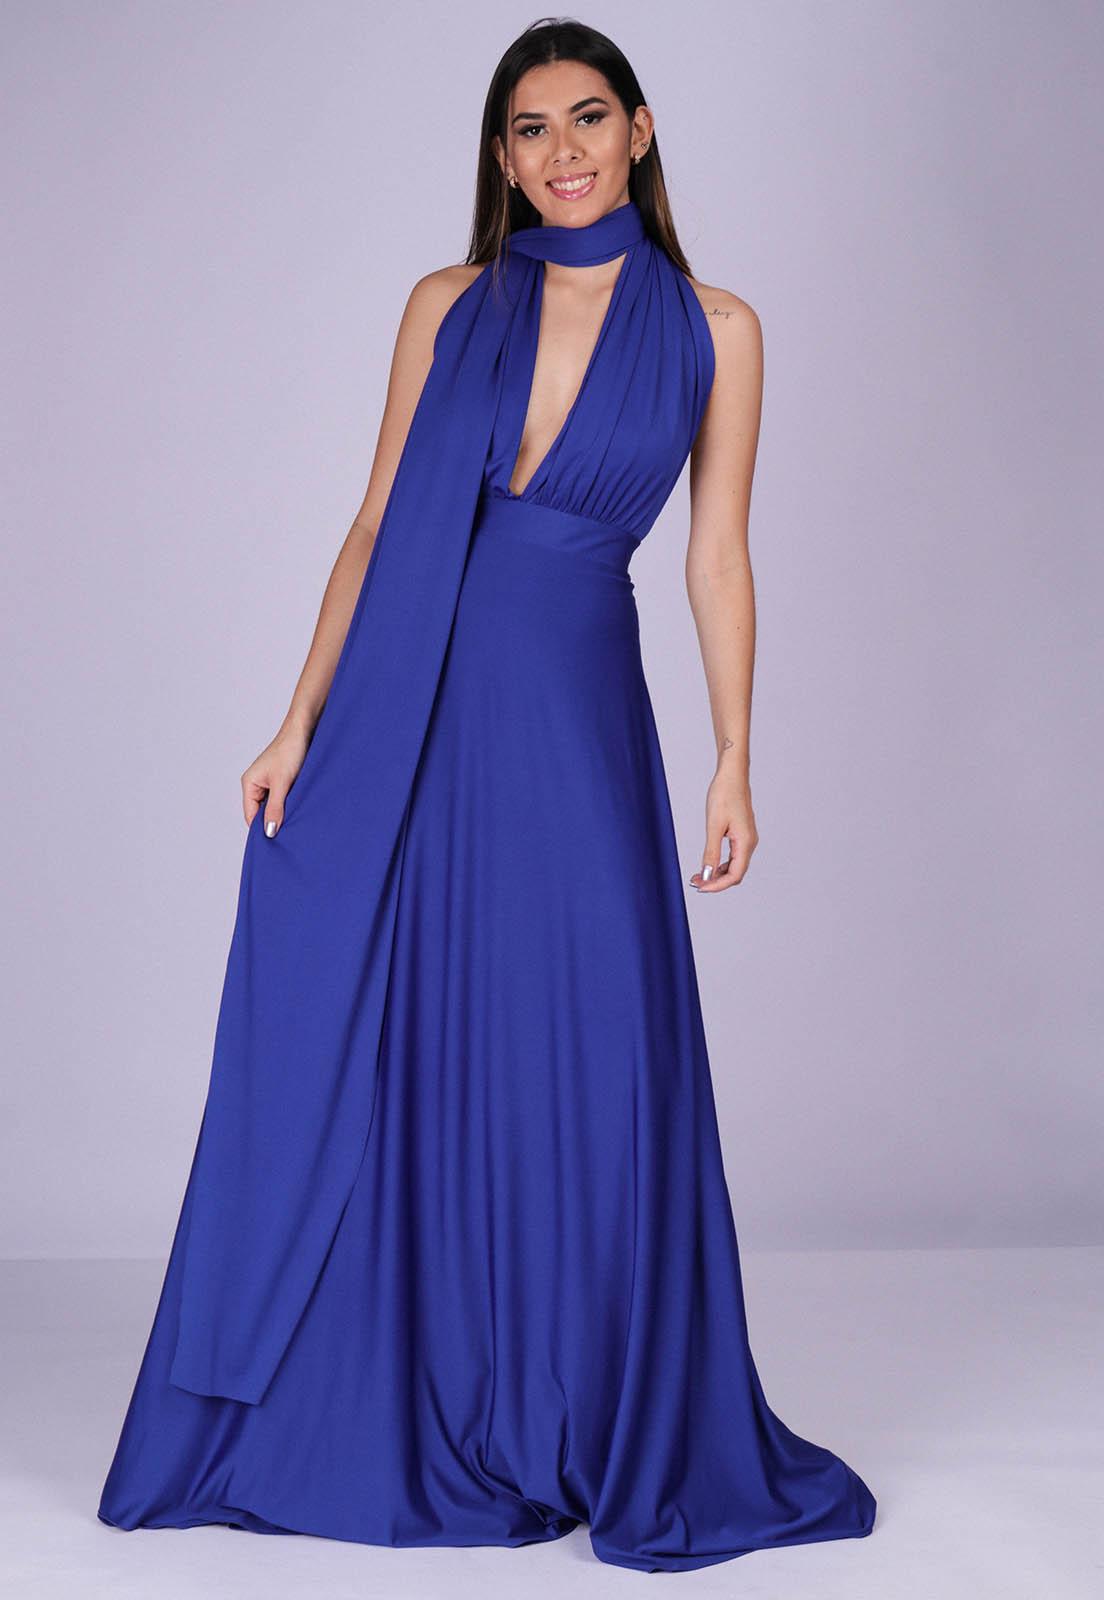 Vestido Longo de Festa Grécia Versatil Azul Bic